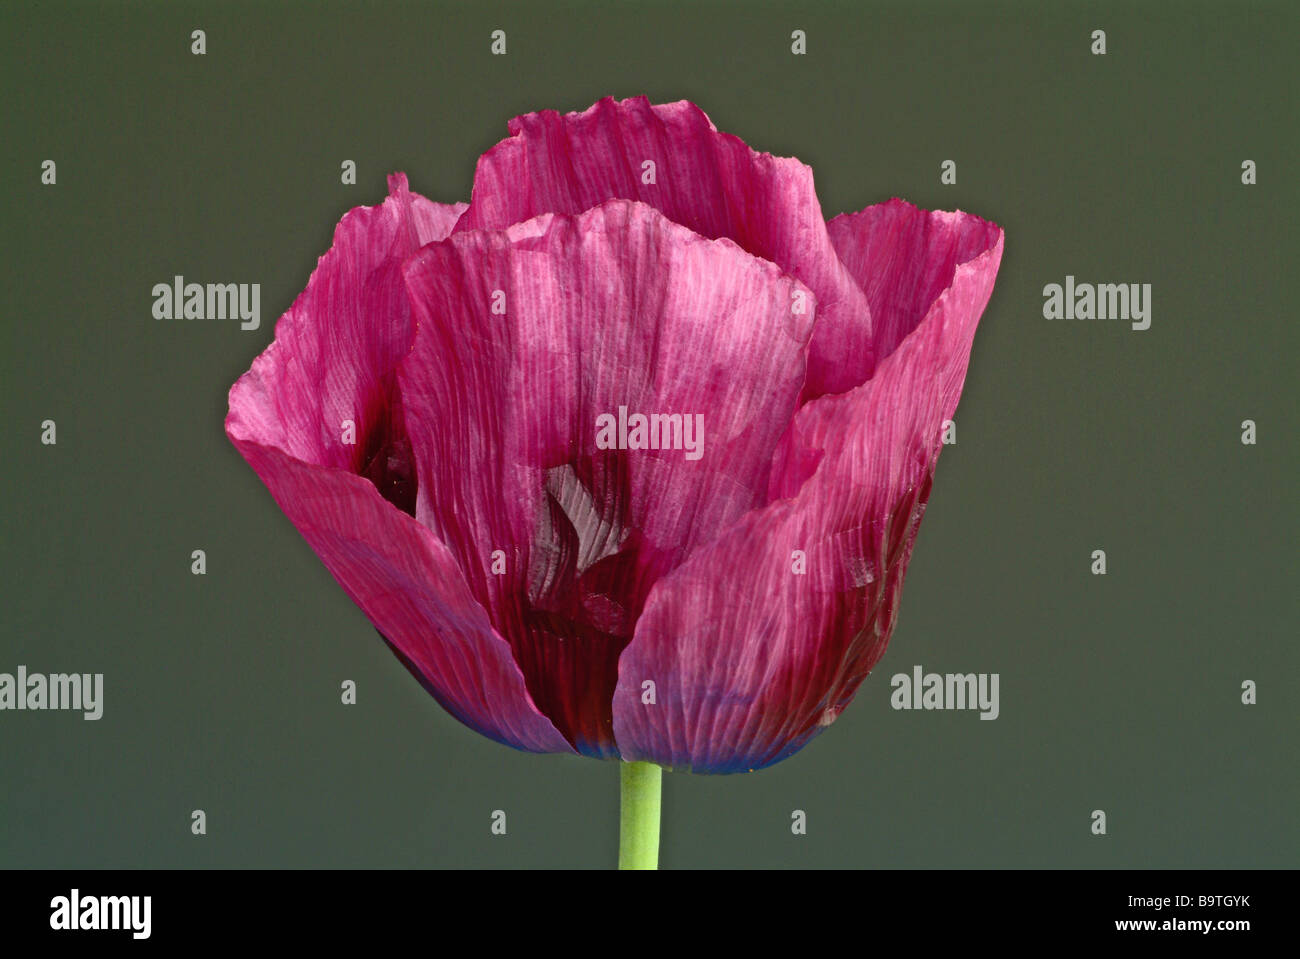 Medicinal plant Schlafmohn blauer Gartenmohn Opiummohn Opium poppy Poppyseed poppy Papaver somniferum var nigrum - Stock Image